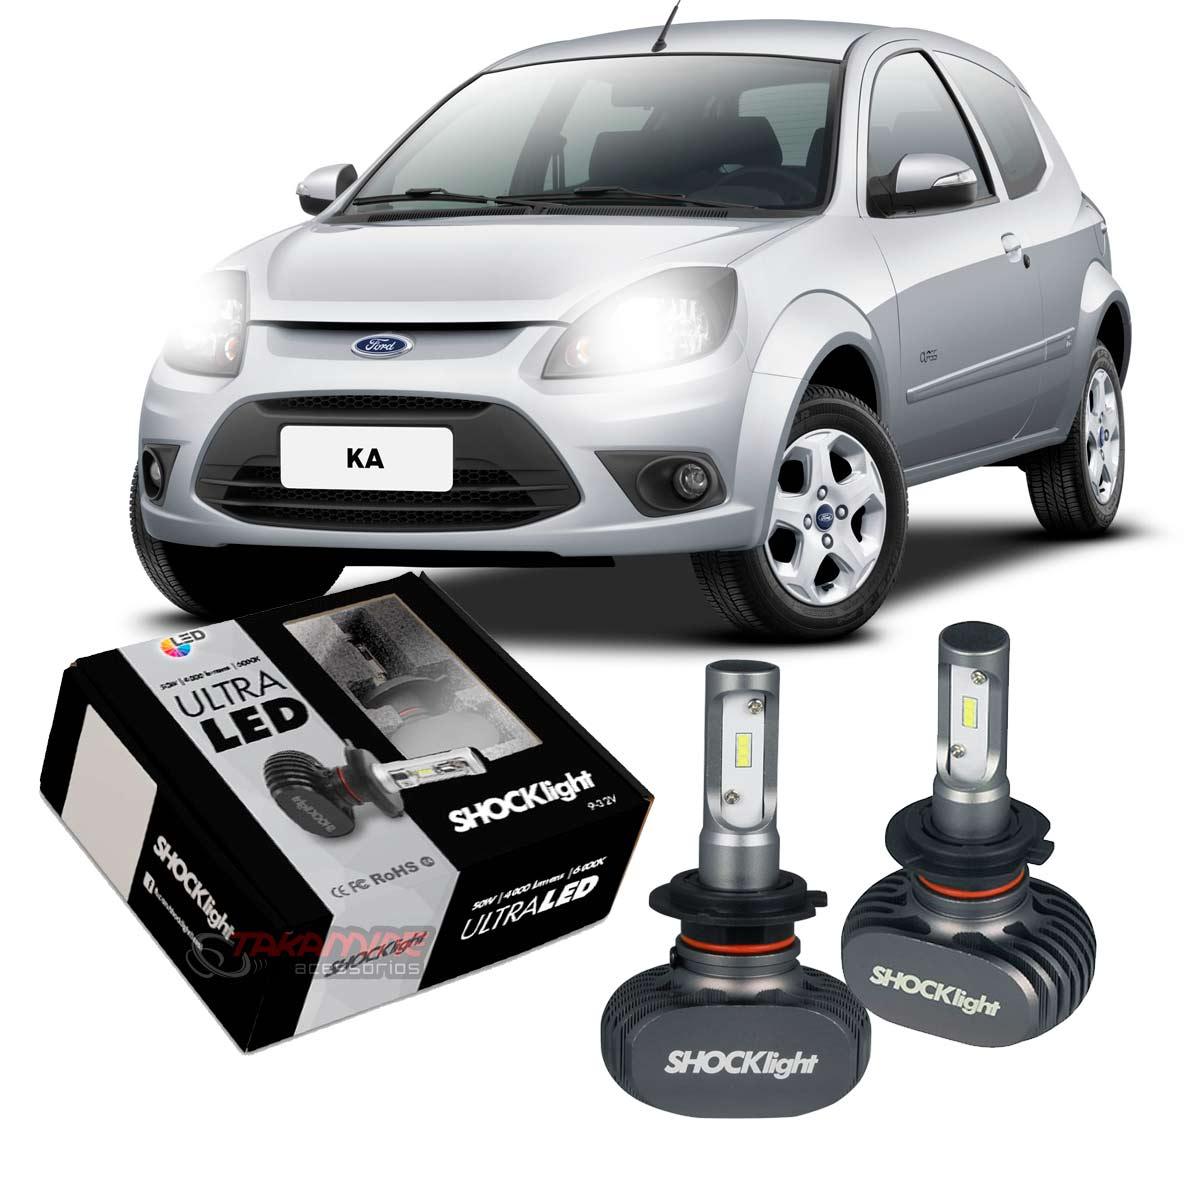 Kit Ultra LED Ka 1997 até 2014 tipo xenon farol baixo H7 50W